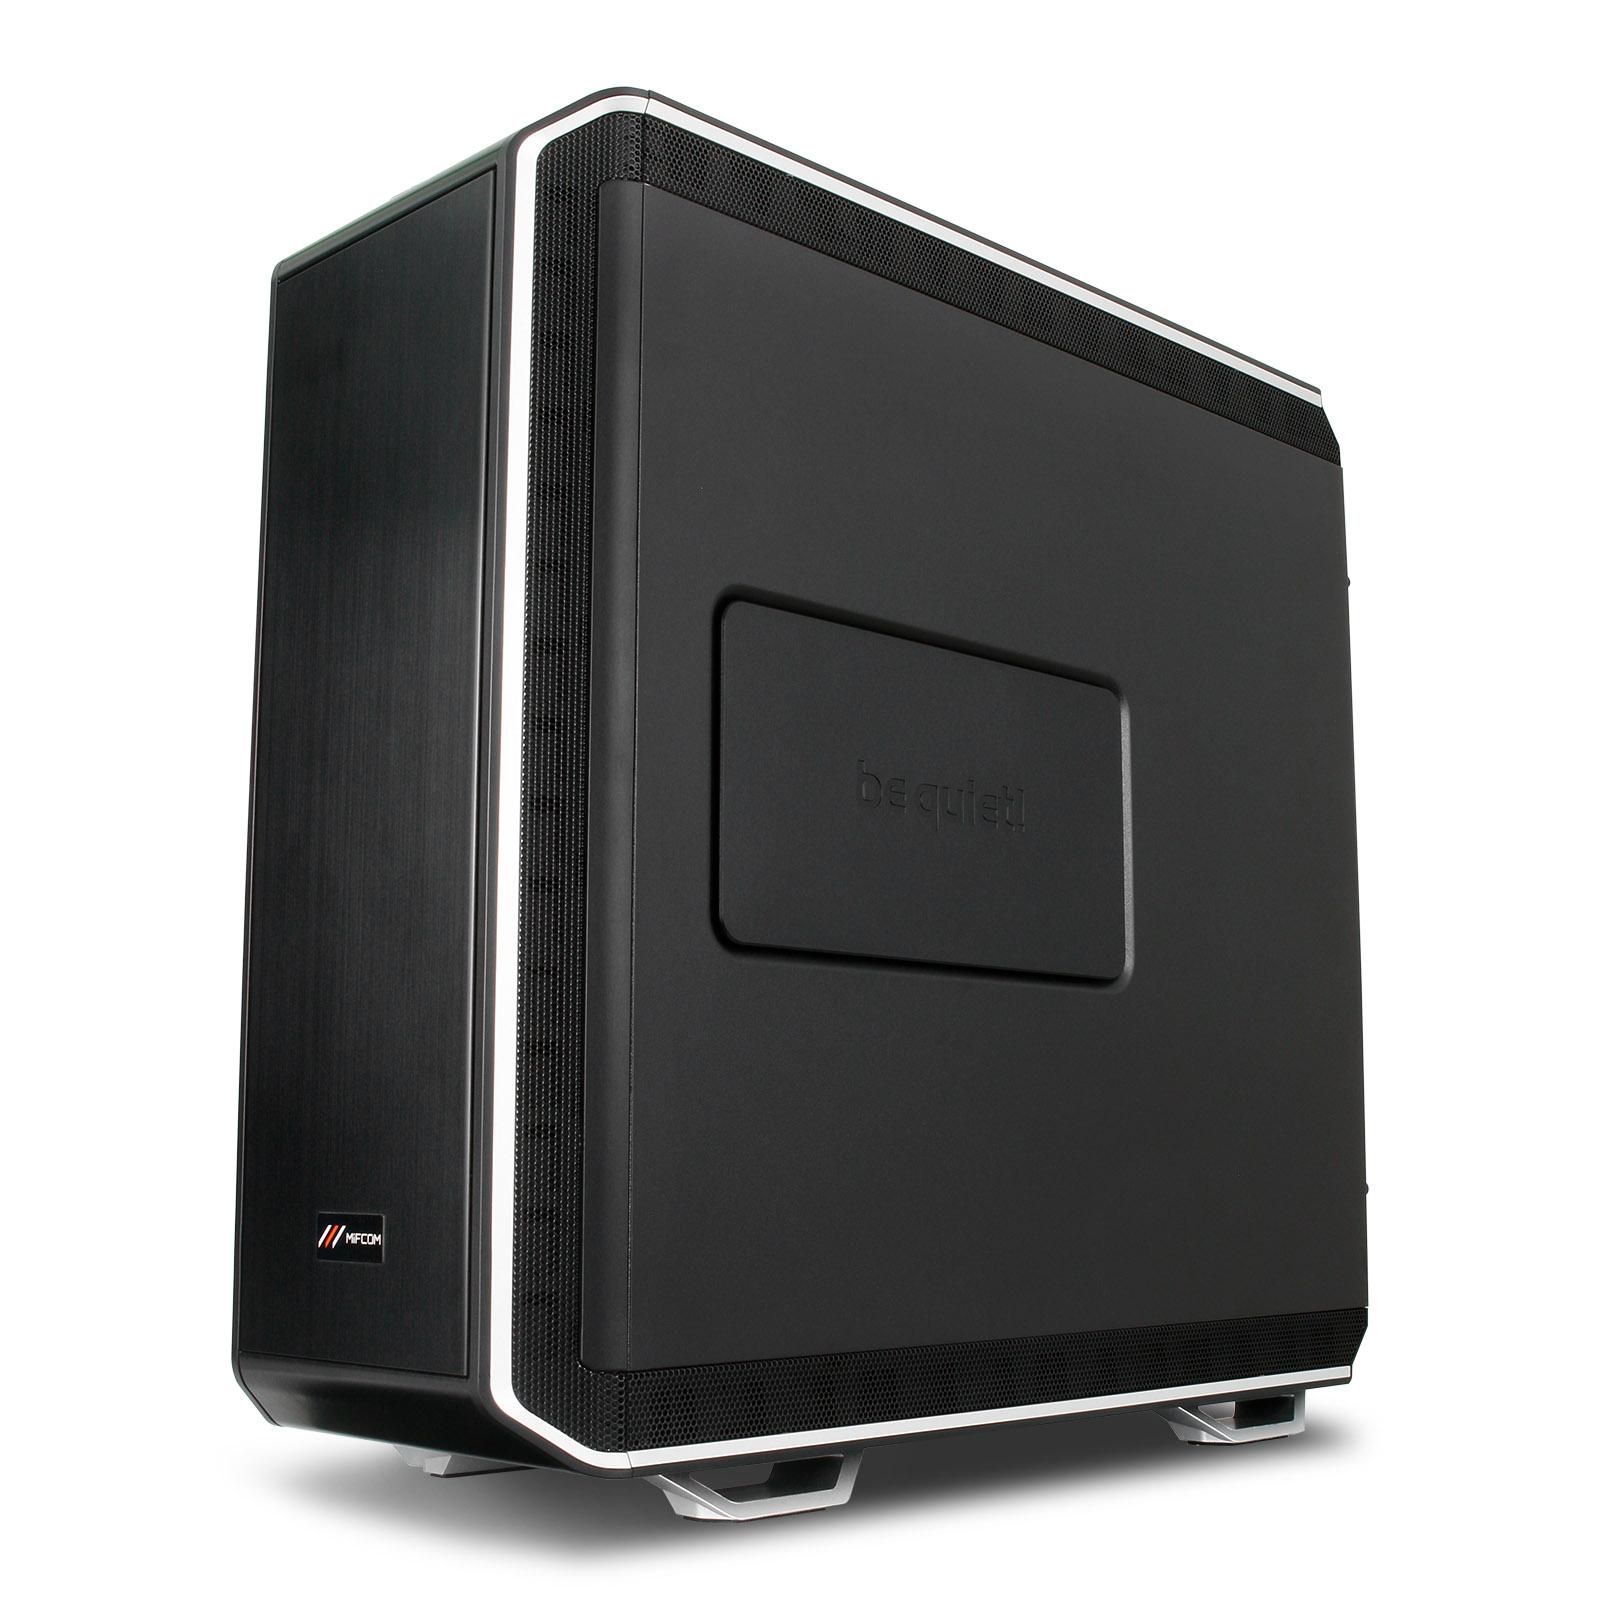 silent pc core i7 7700k gtx 1080 ti ssd be quiet silent pc be quiet edition. Black Bedroom Furniture Sets. Home Design Ideas